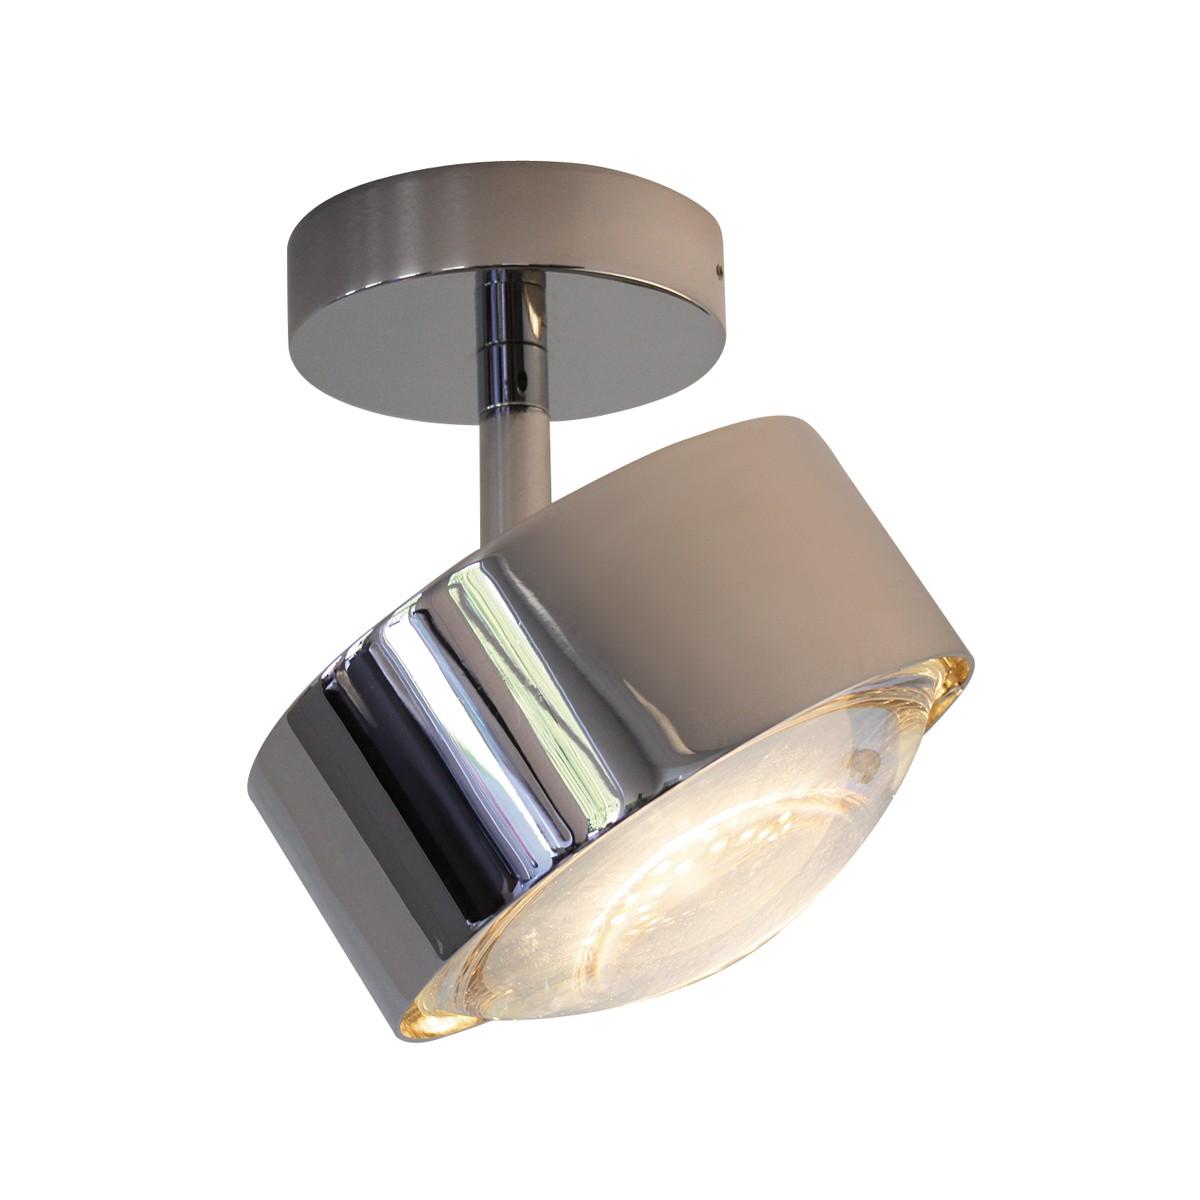 Top Light Puk Maxx Turn LED Up & Down Deckenleuchte